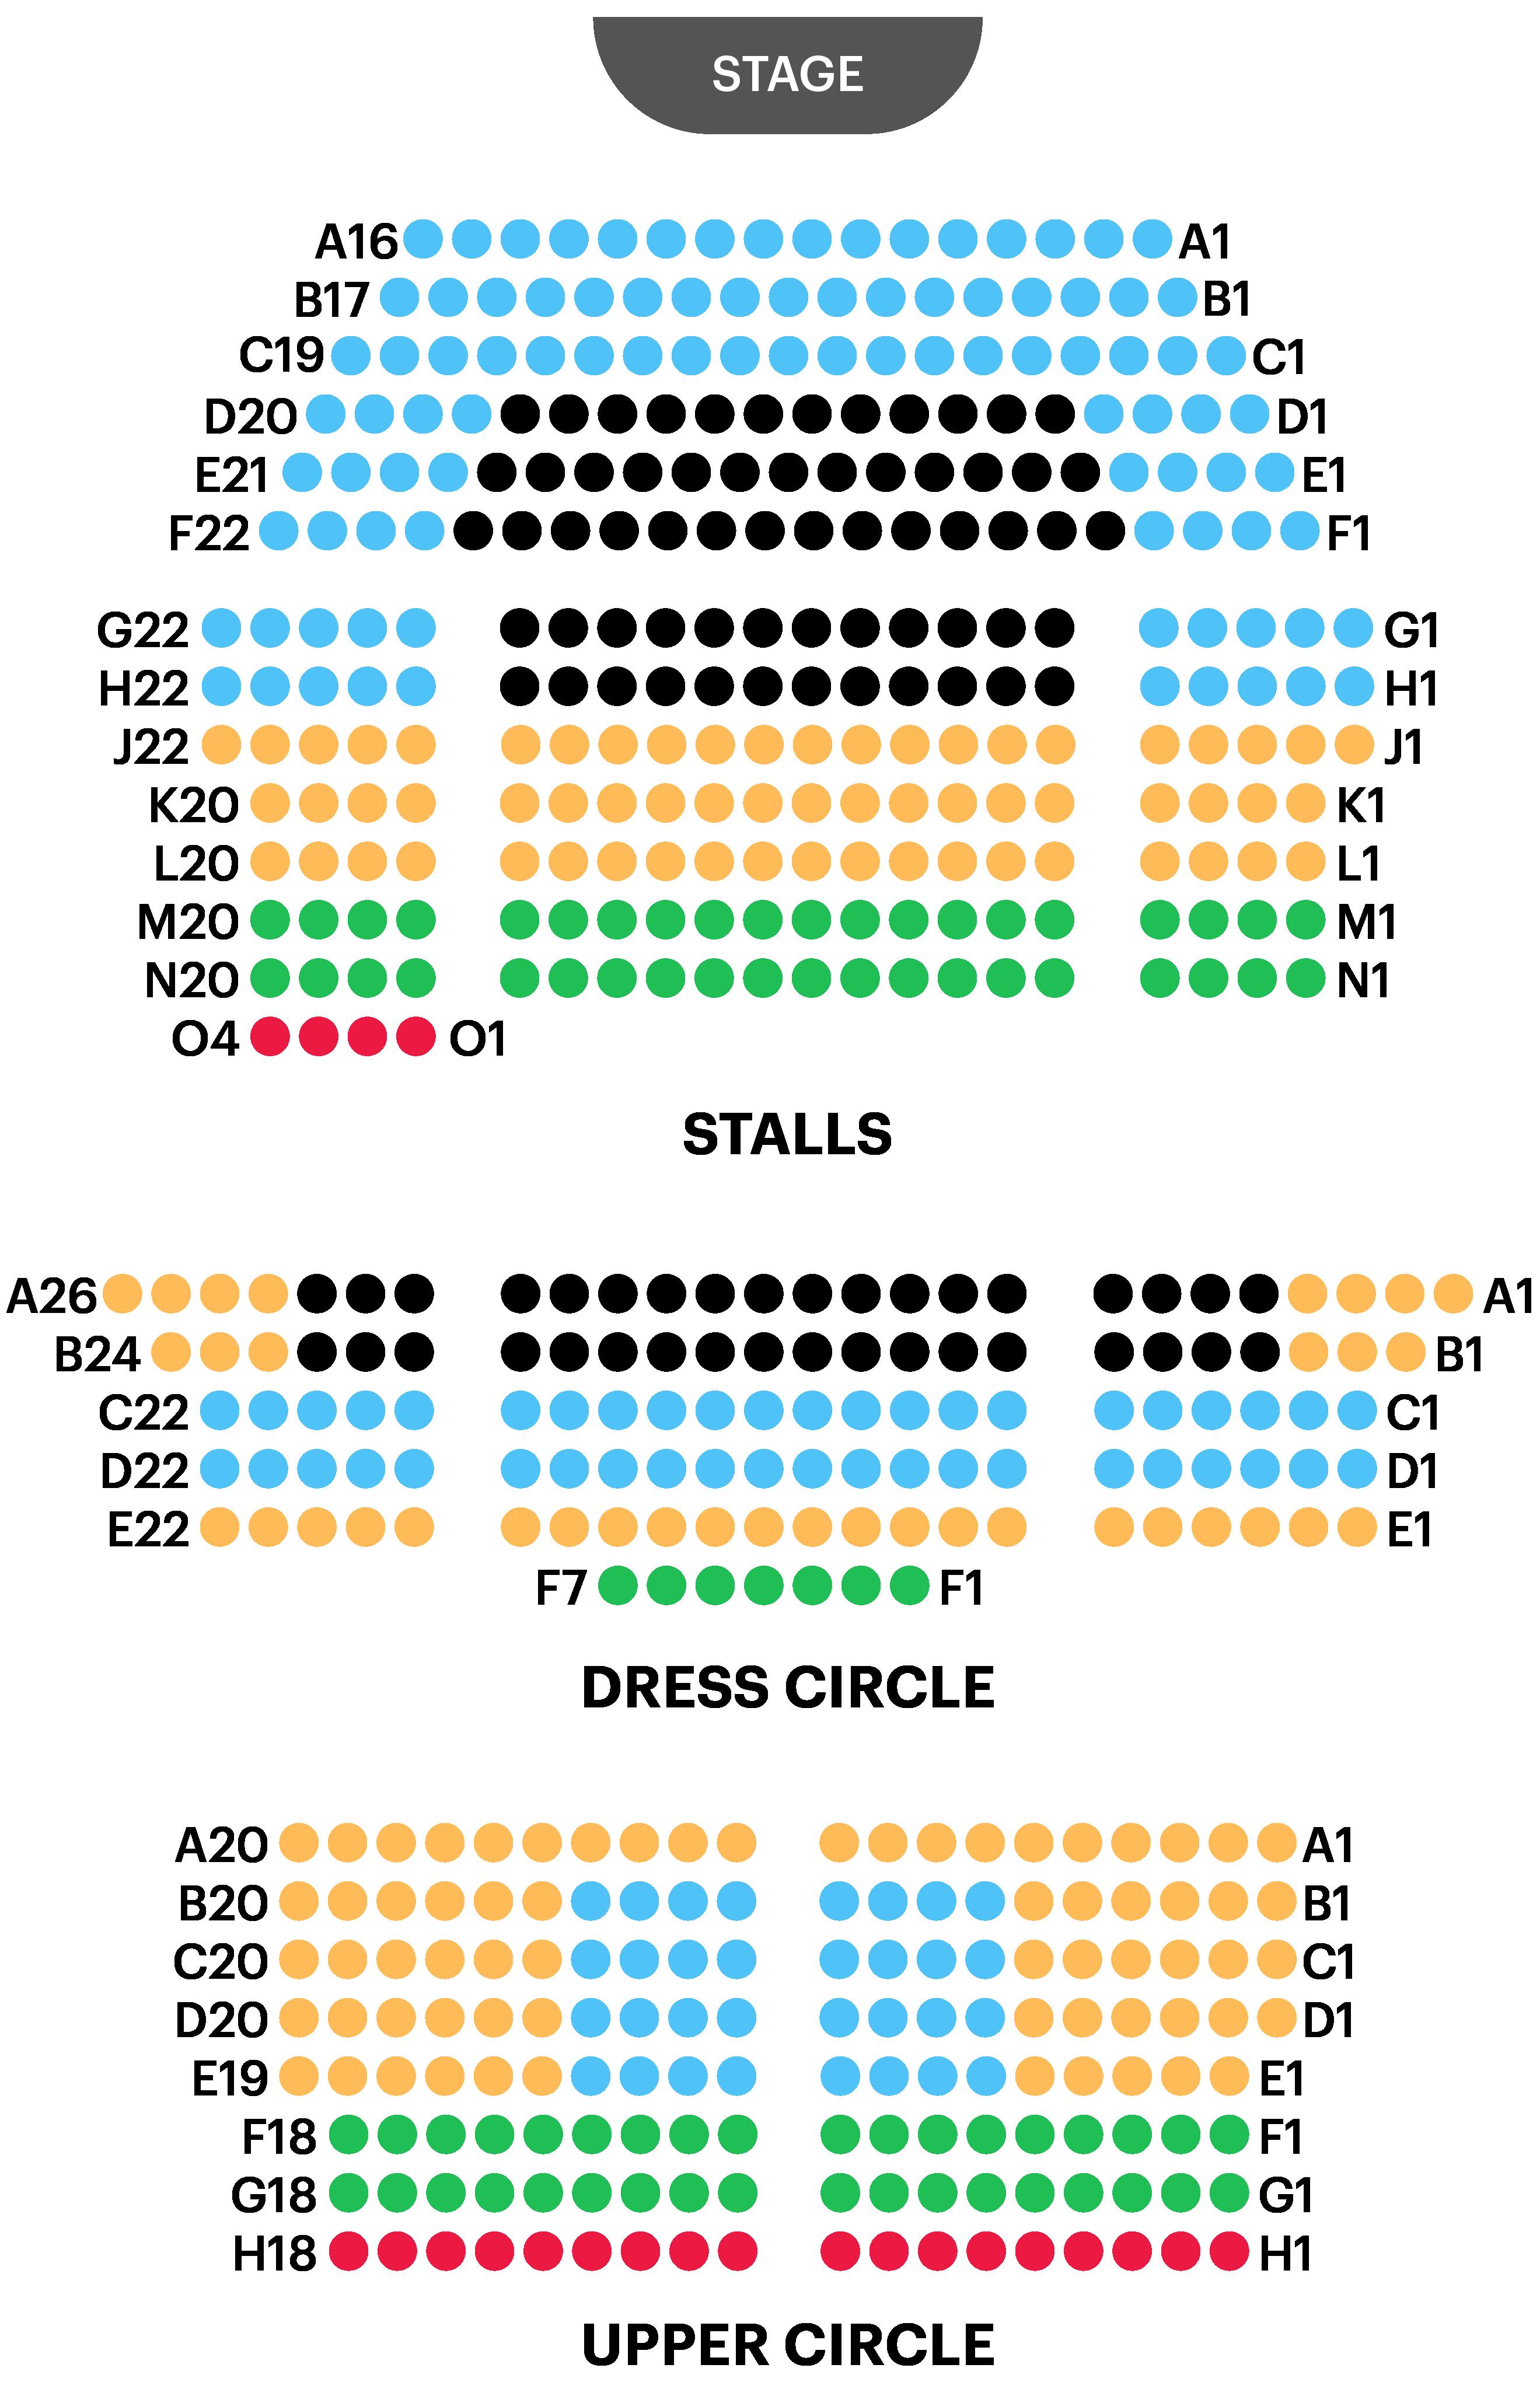 St. Martin's Theatre Seating Plan